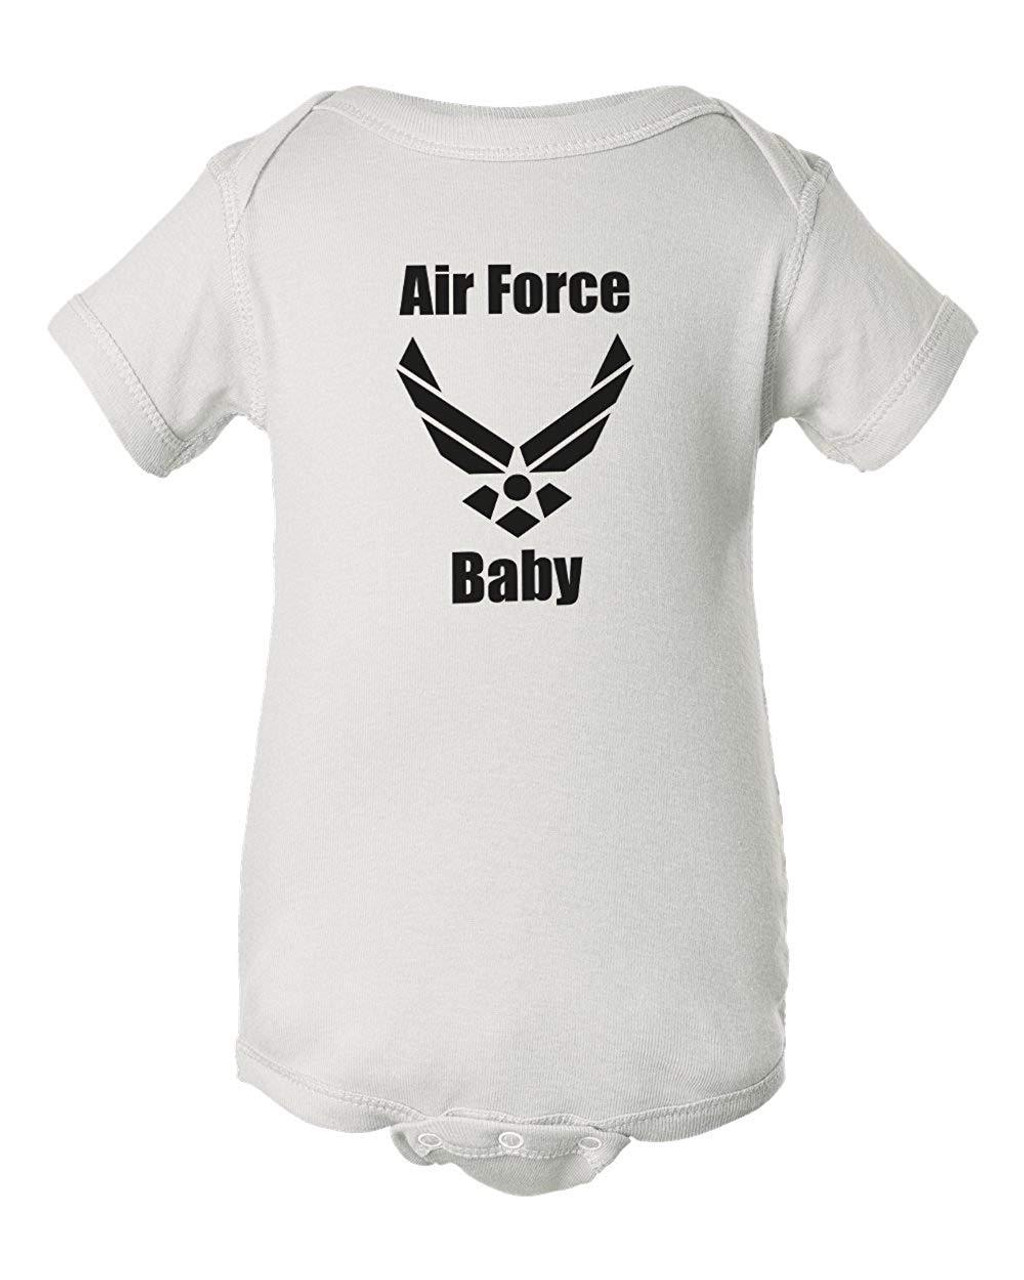 Air Force Baby White Bodysuit Infant Romper